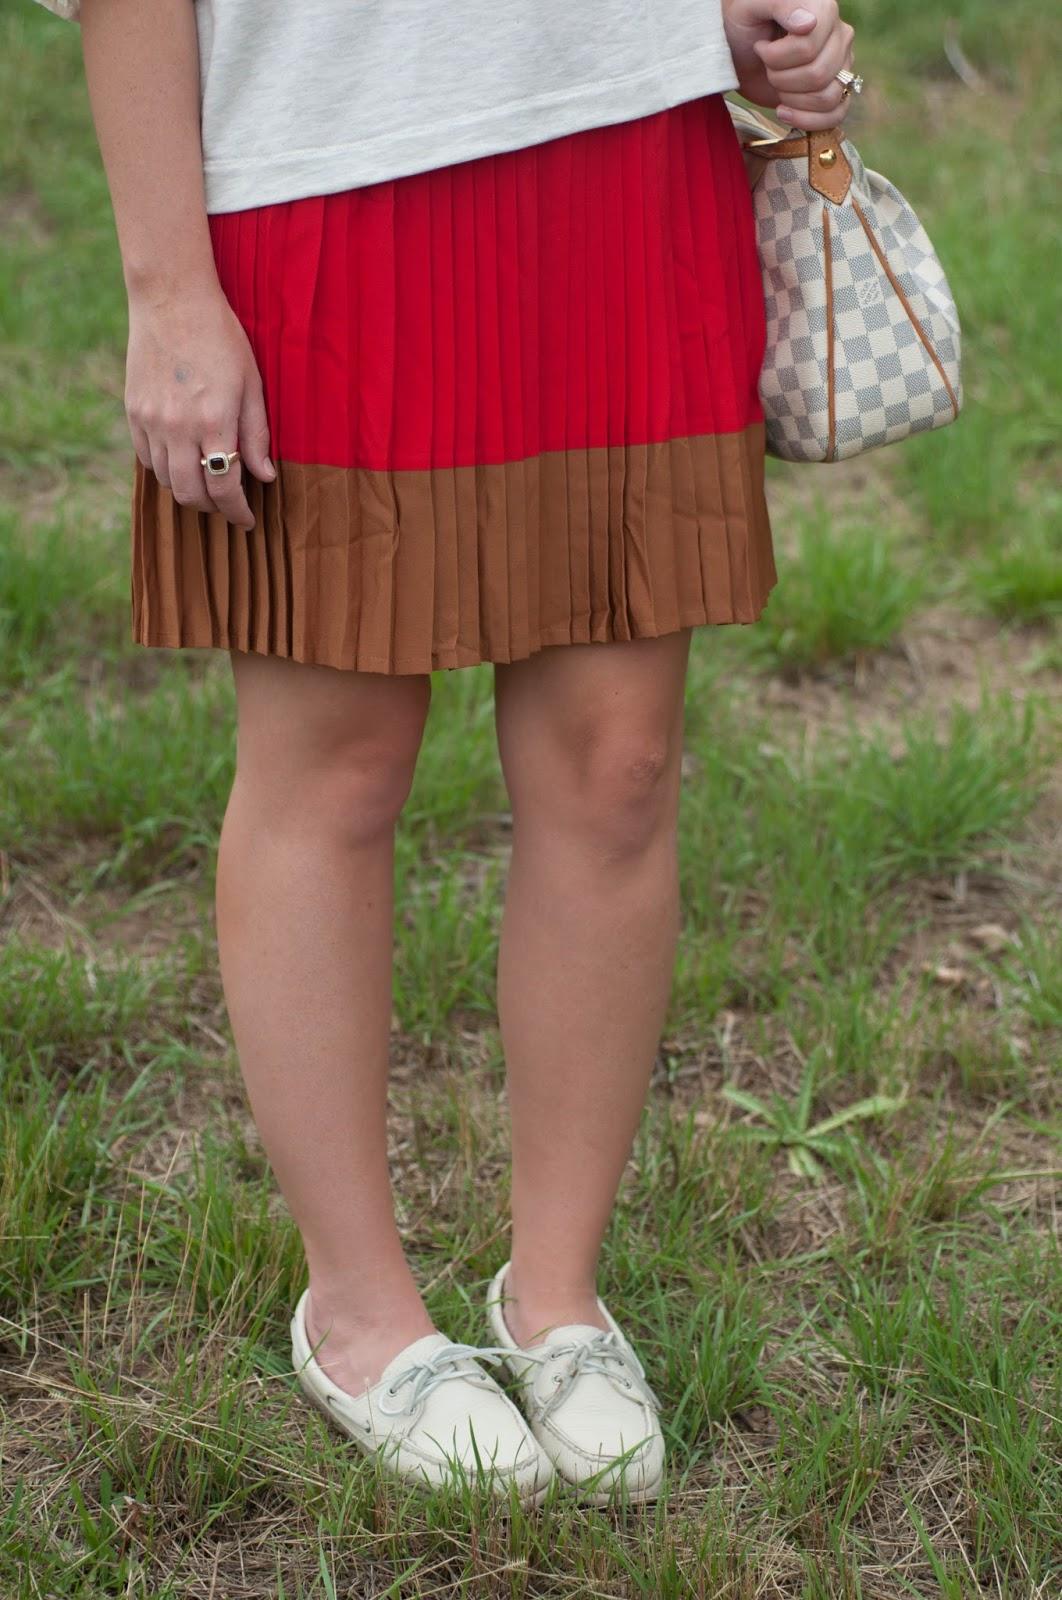 lands end skirt, lands end clothing, ootd, sperry topsider for women, sperry topsider